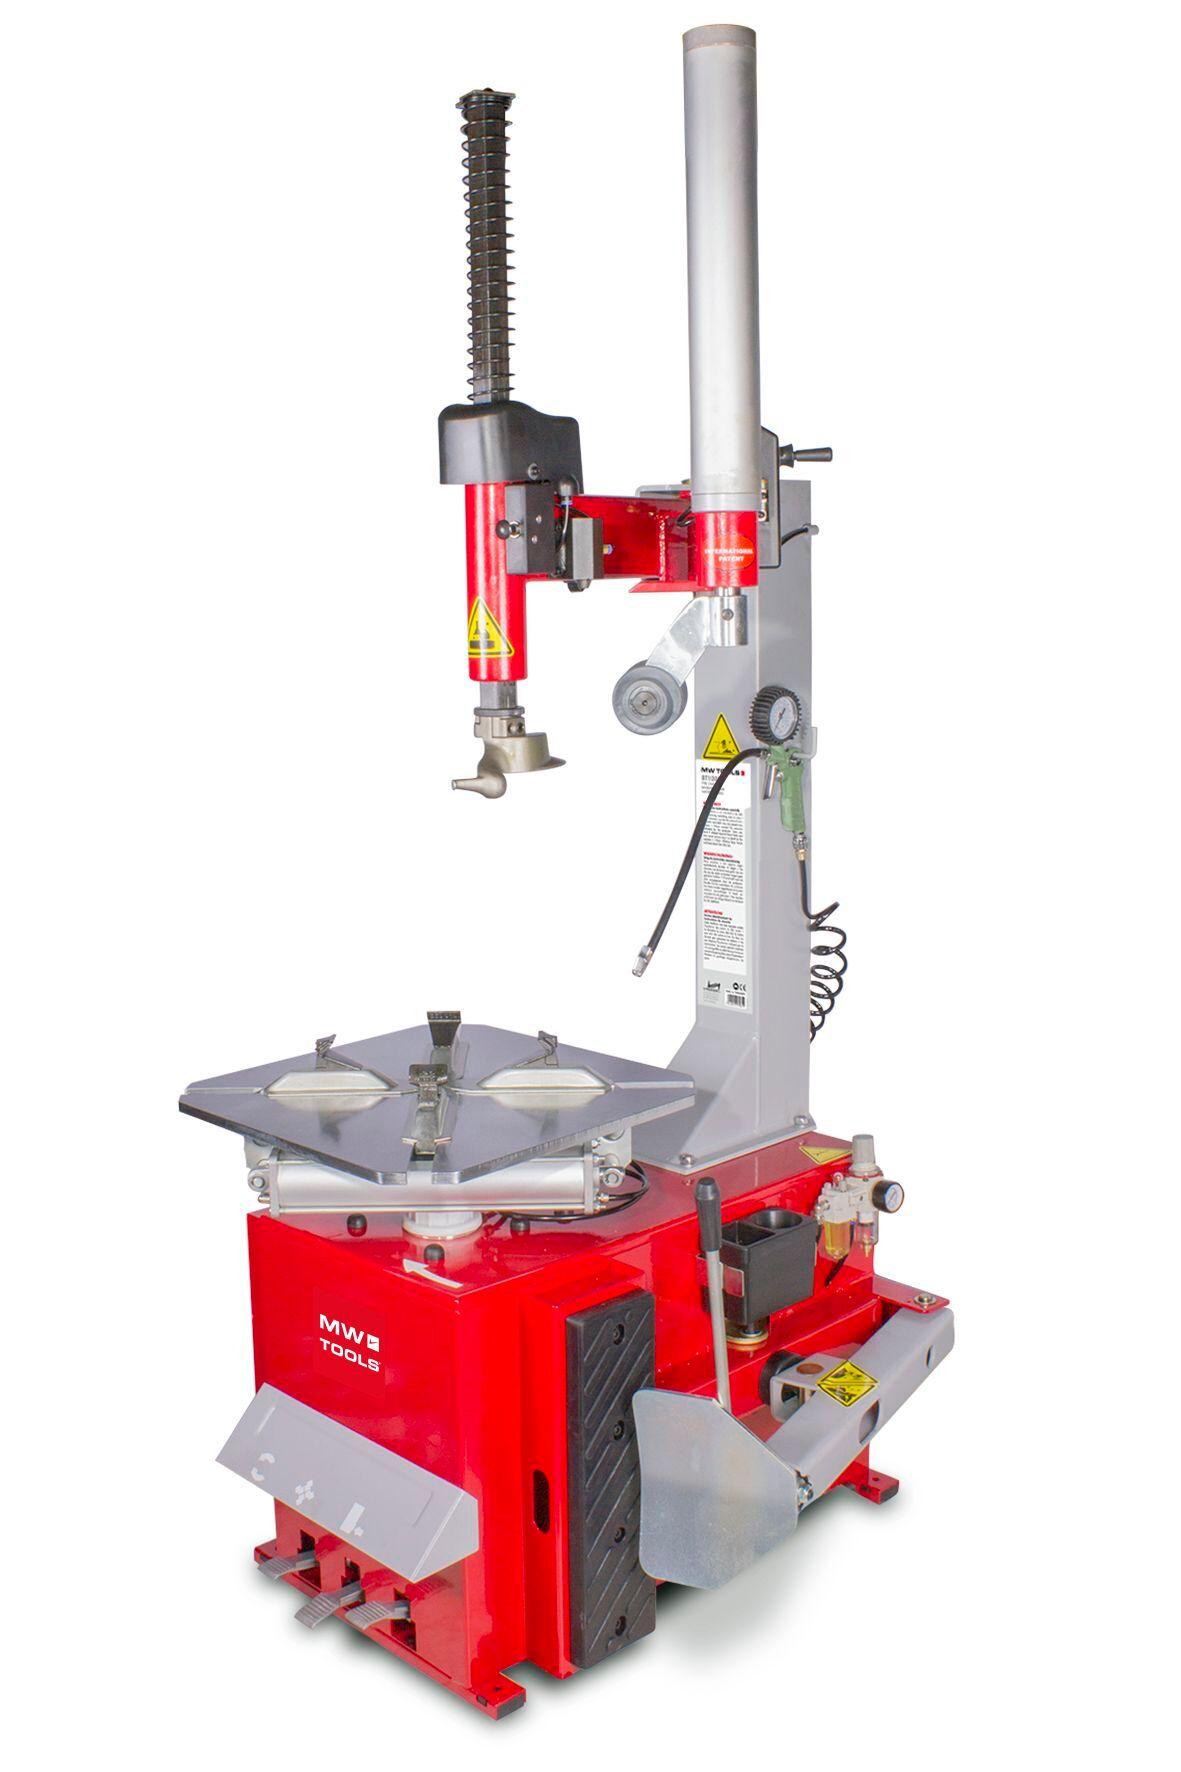 Mw-tools Démonte-pneus pneumatique avec bras d'assistance 380V - pneu 10 à 24 MW-Tools BT200